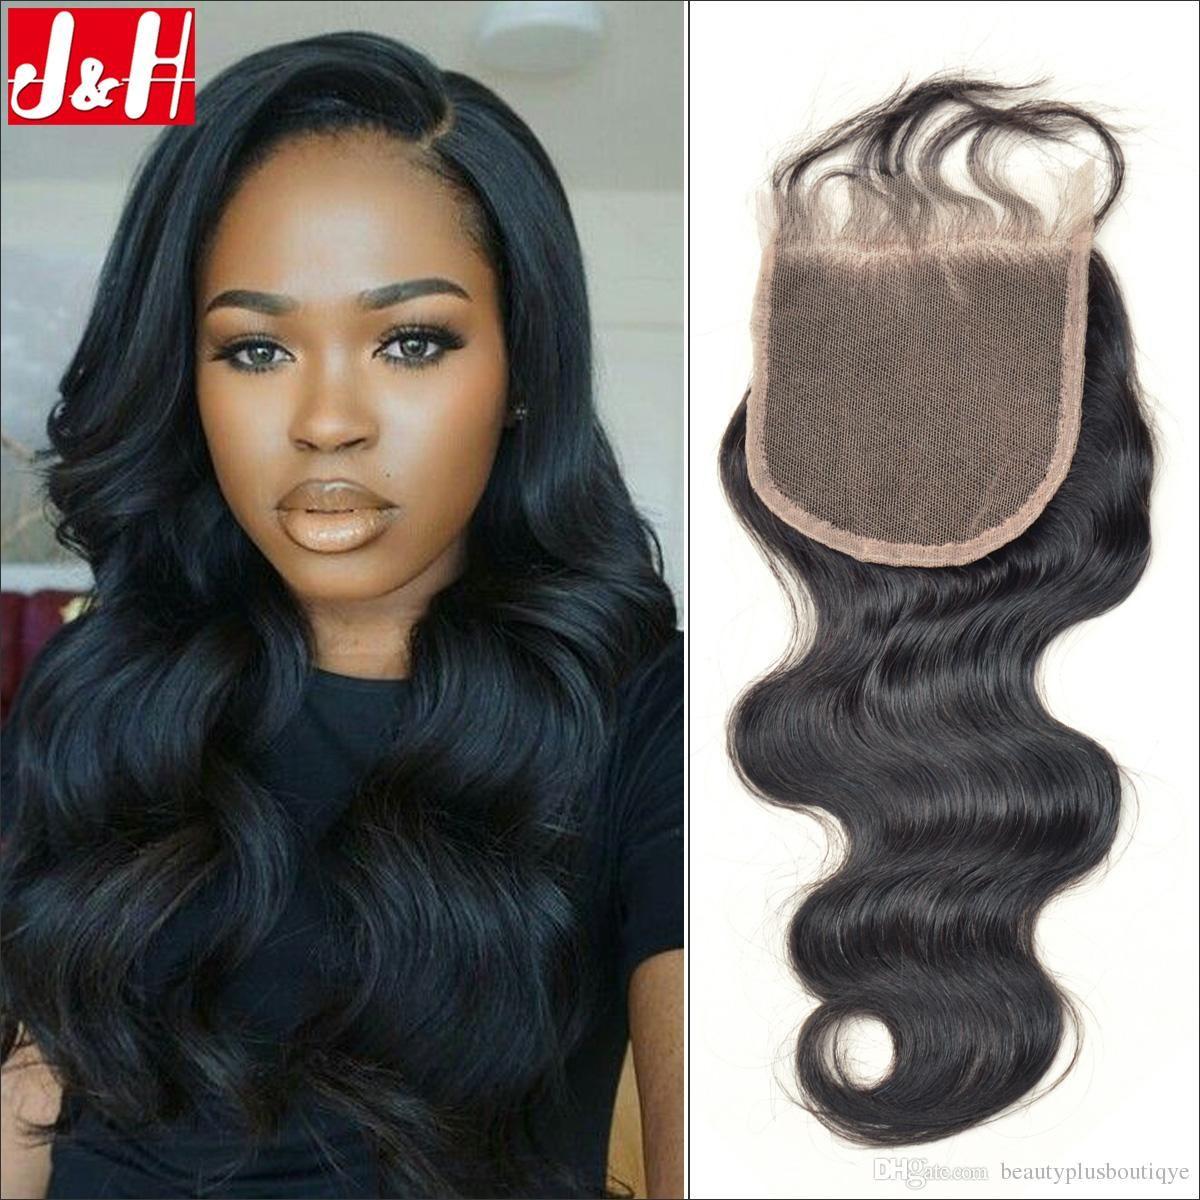 Where to buy hair closures - 8a Good Quality Top Lace Closure 4x4 Inch 8 22 Inch Brazilian Virgin Human Hair